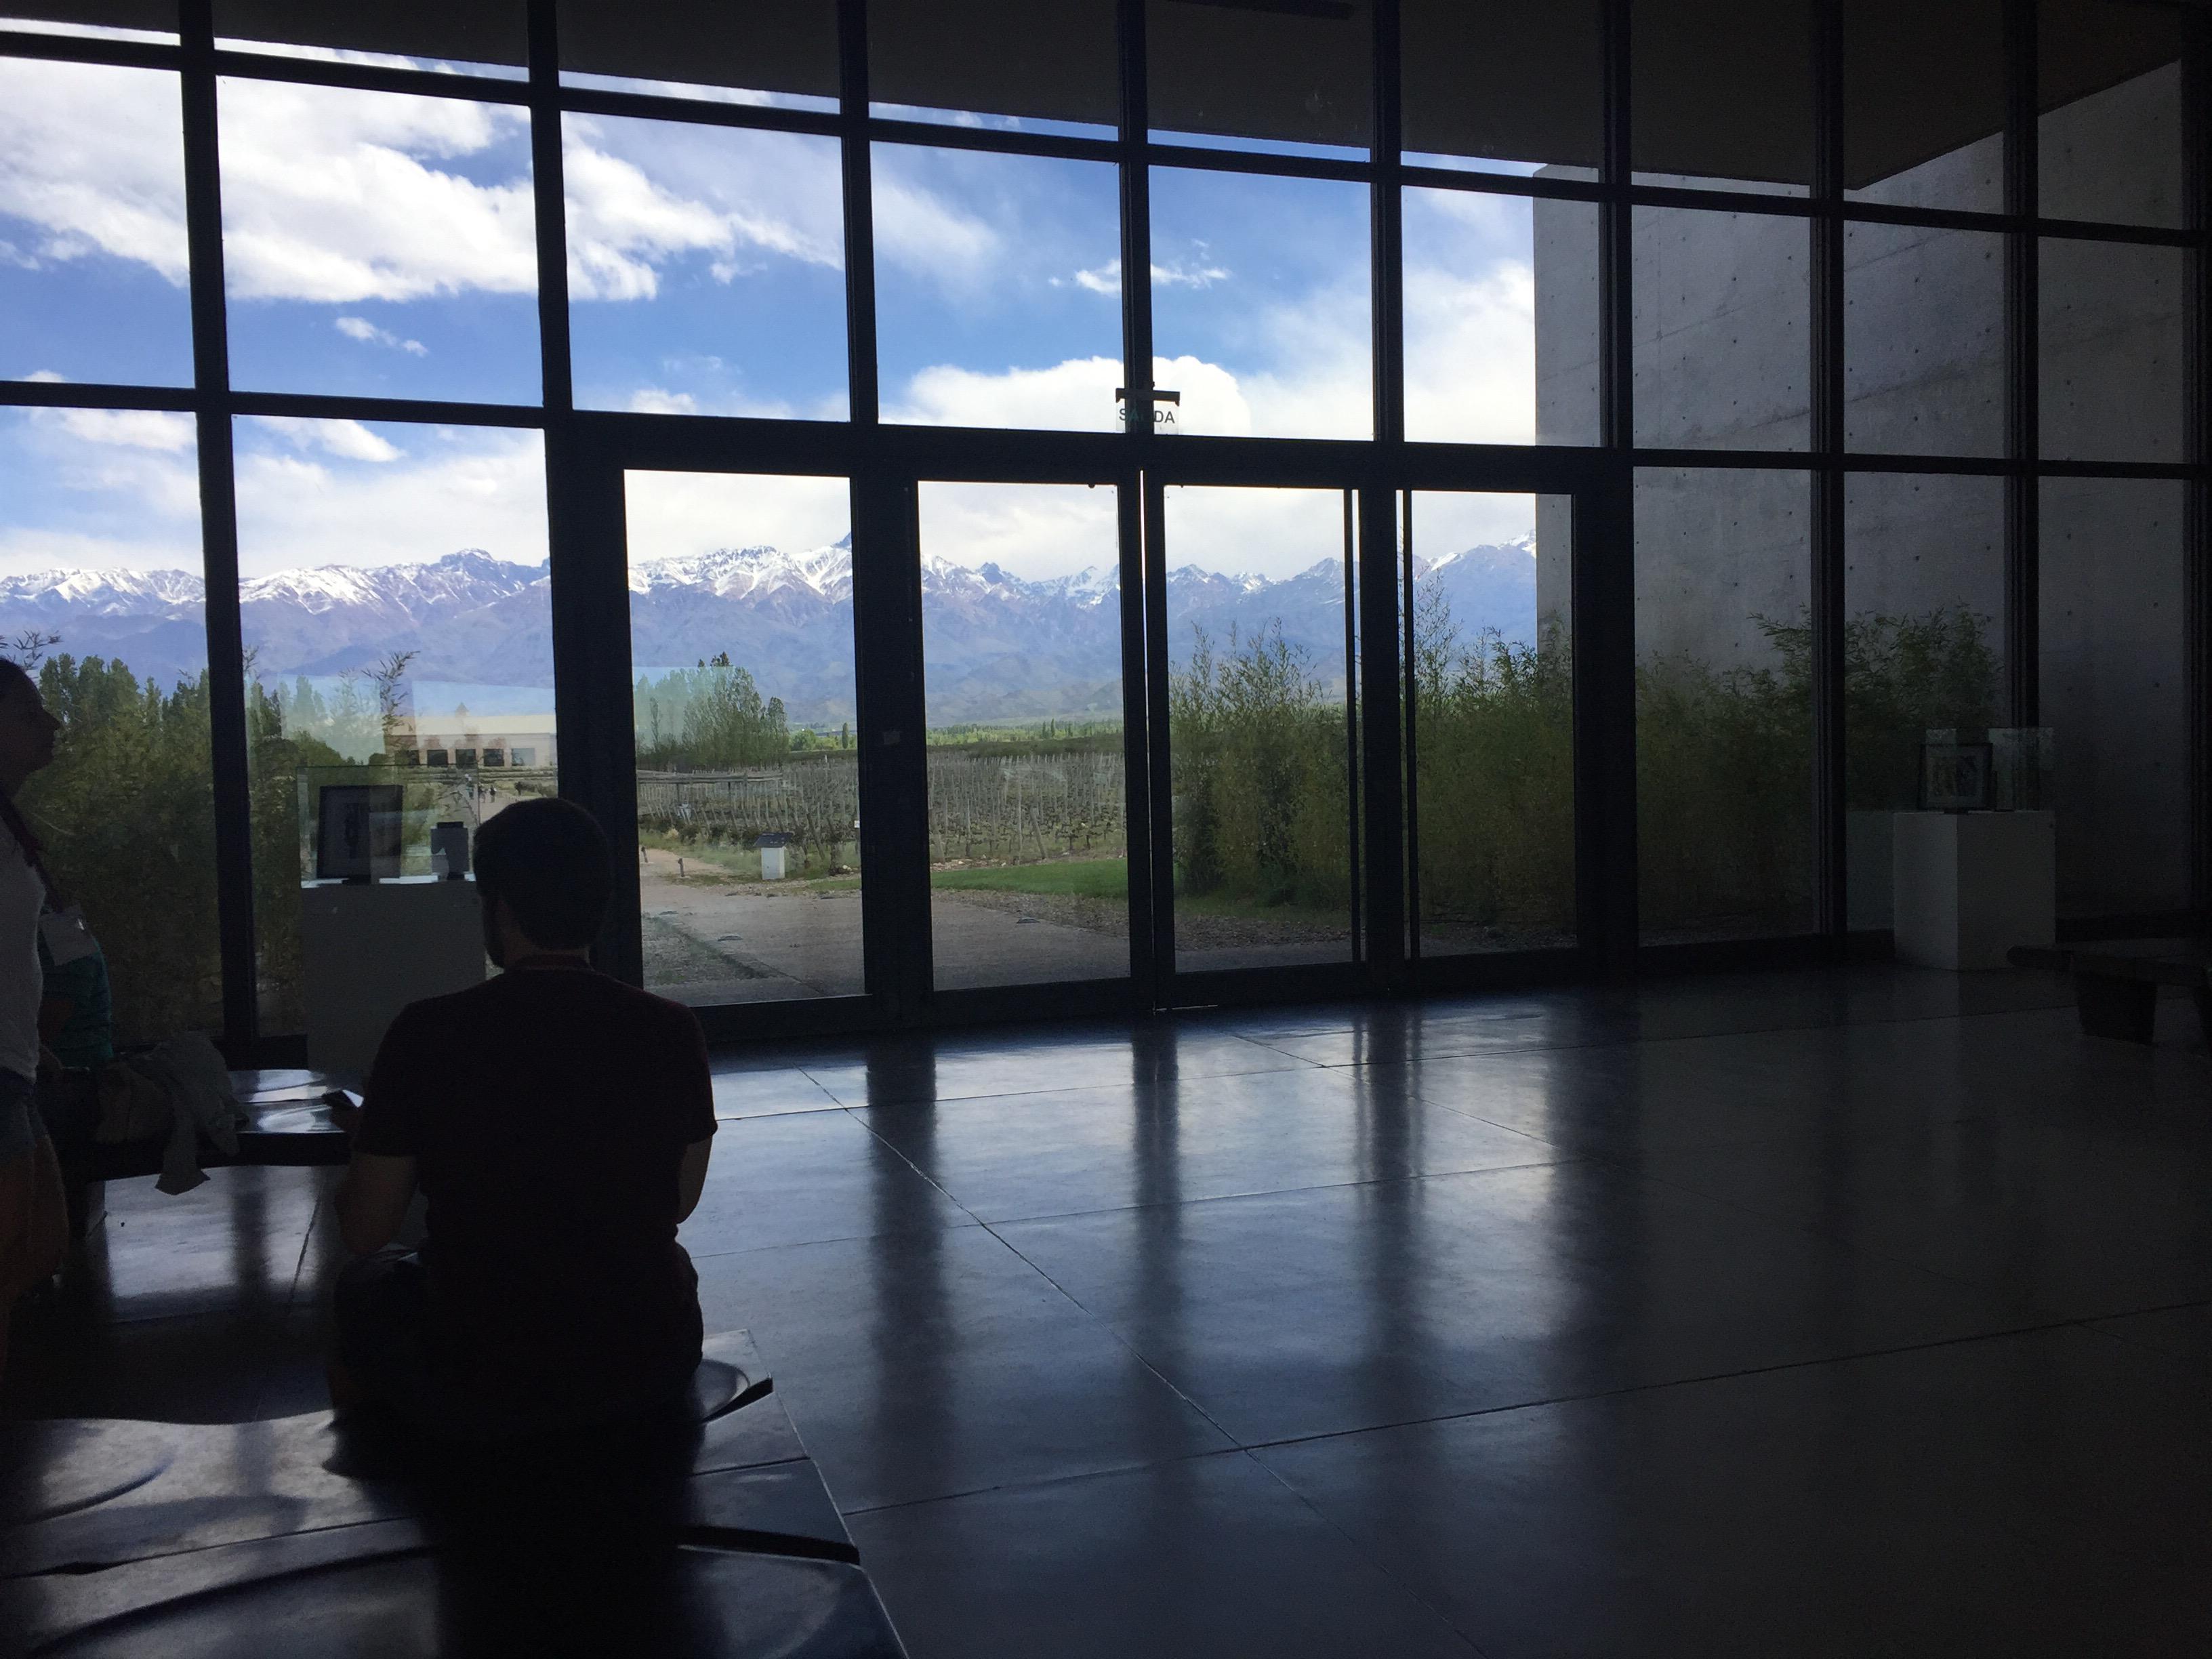 img 8824 - Paseando por la Bodega Salentein en Mendoza